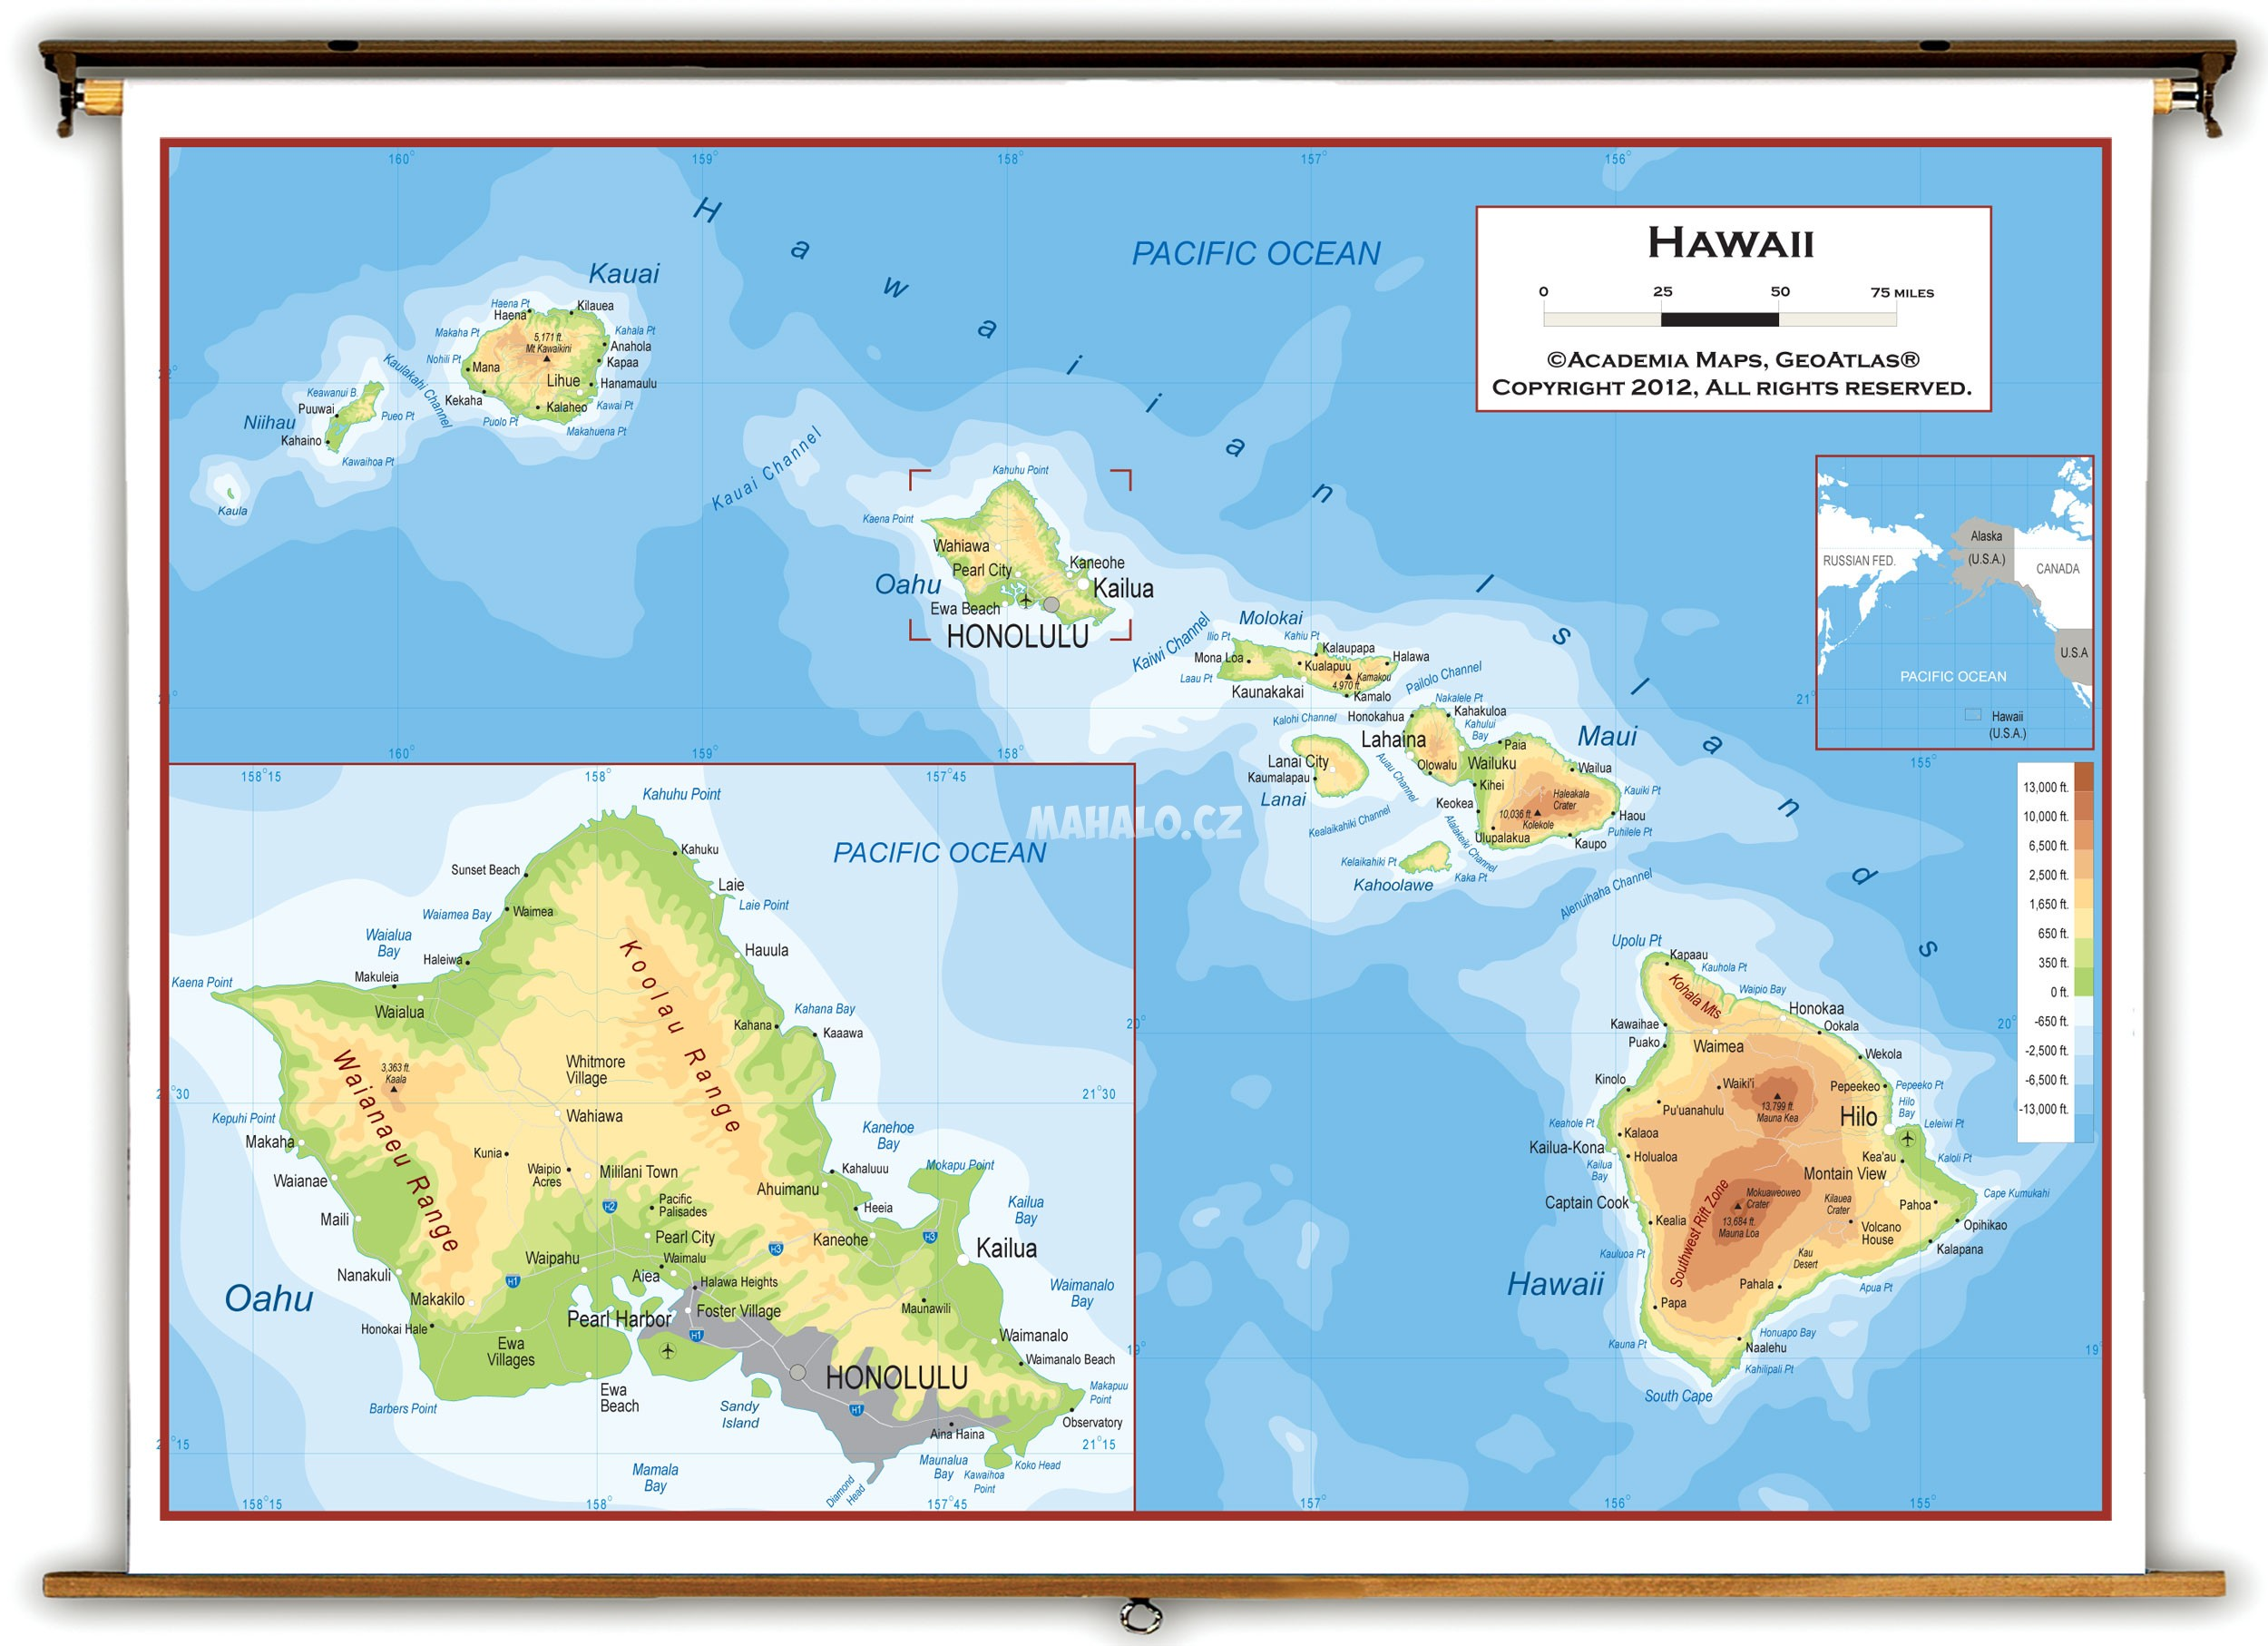 Pruvodce Po Havajskych Ostrovech Mahalo Cz